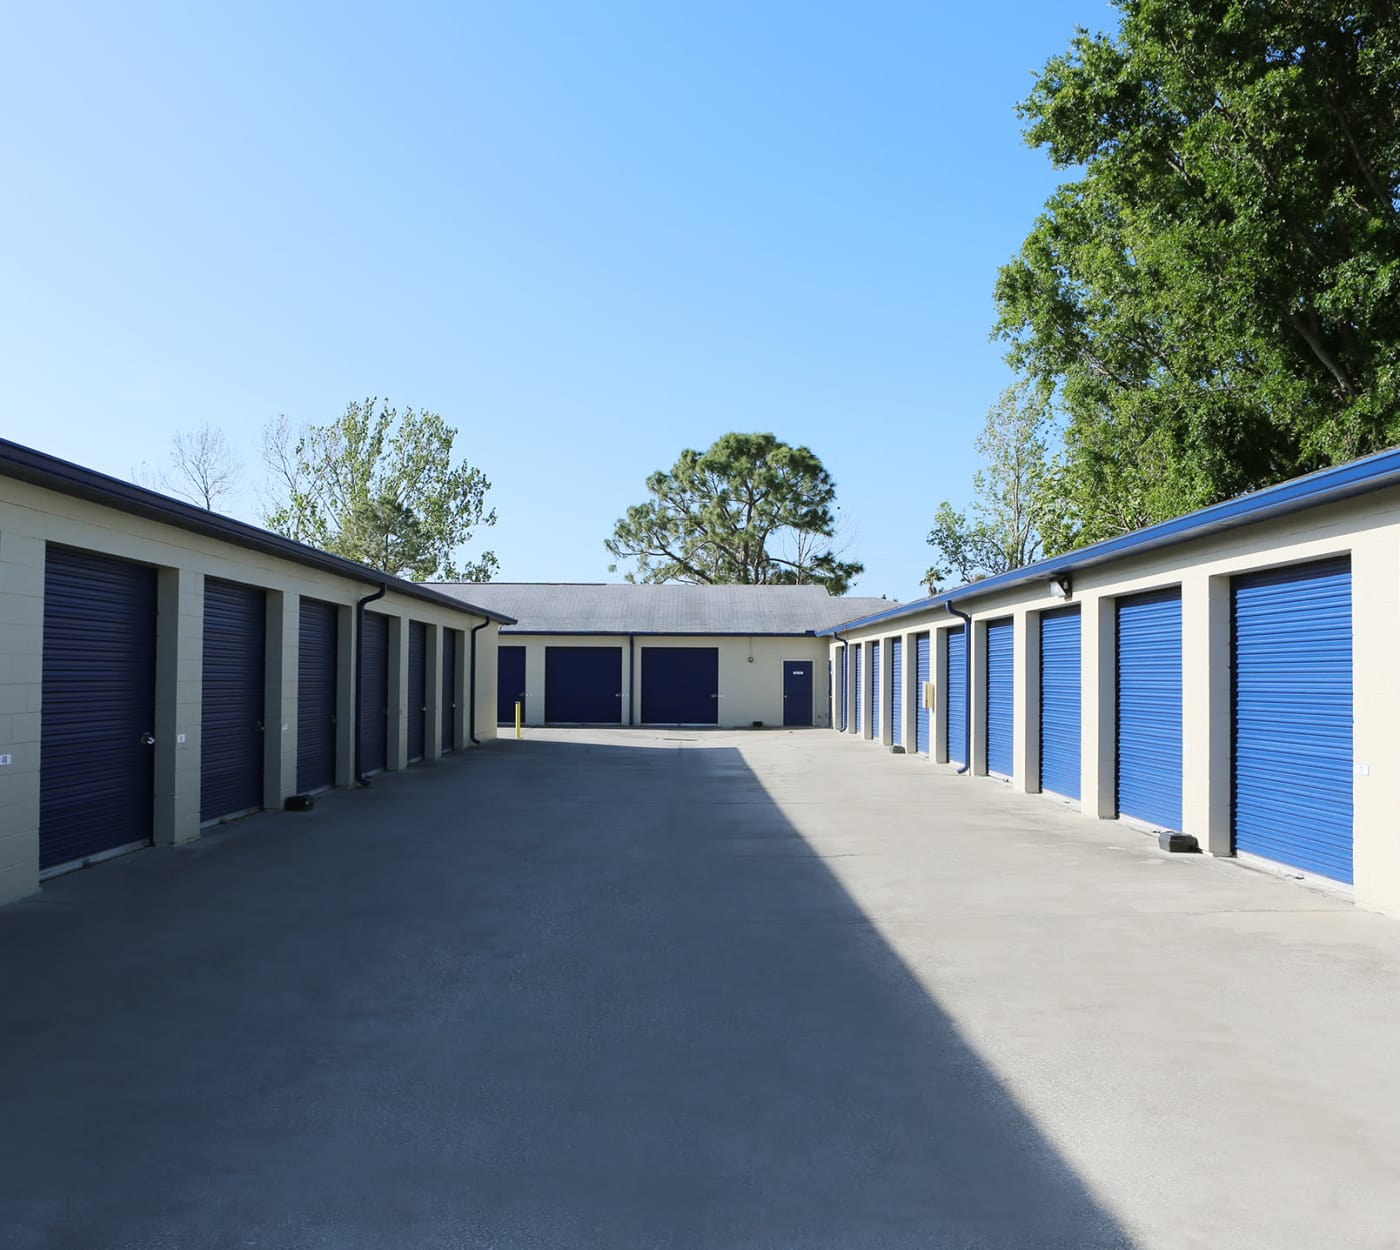 Ground-floor unit at Midgard Self Storage in Mulberry, Florida